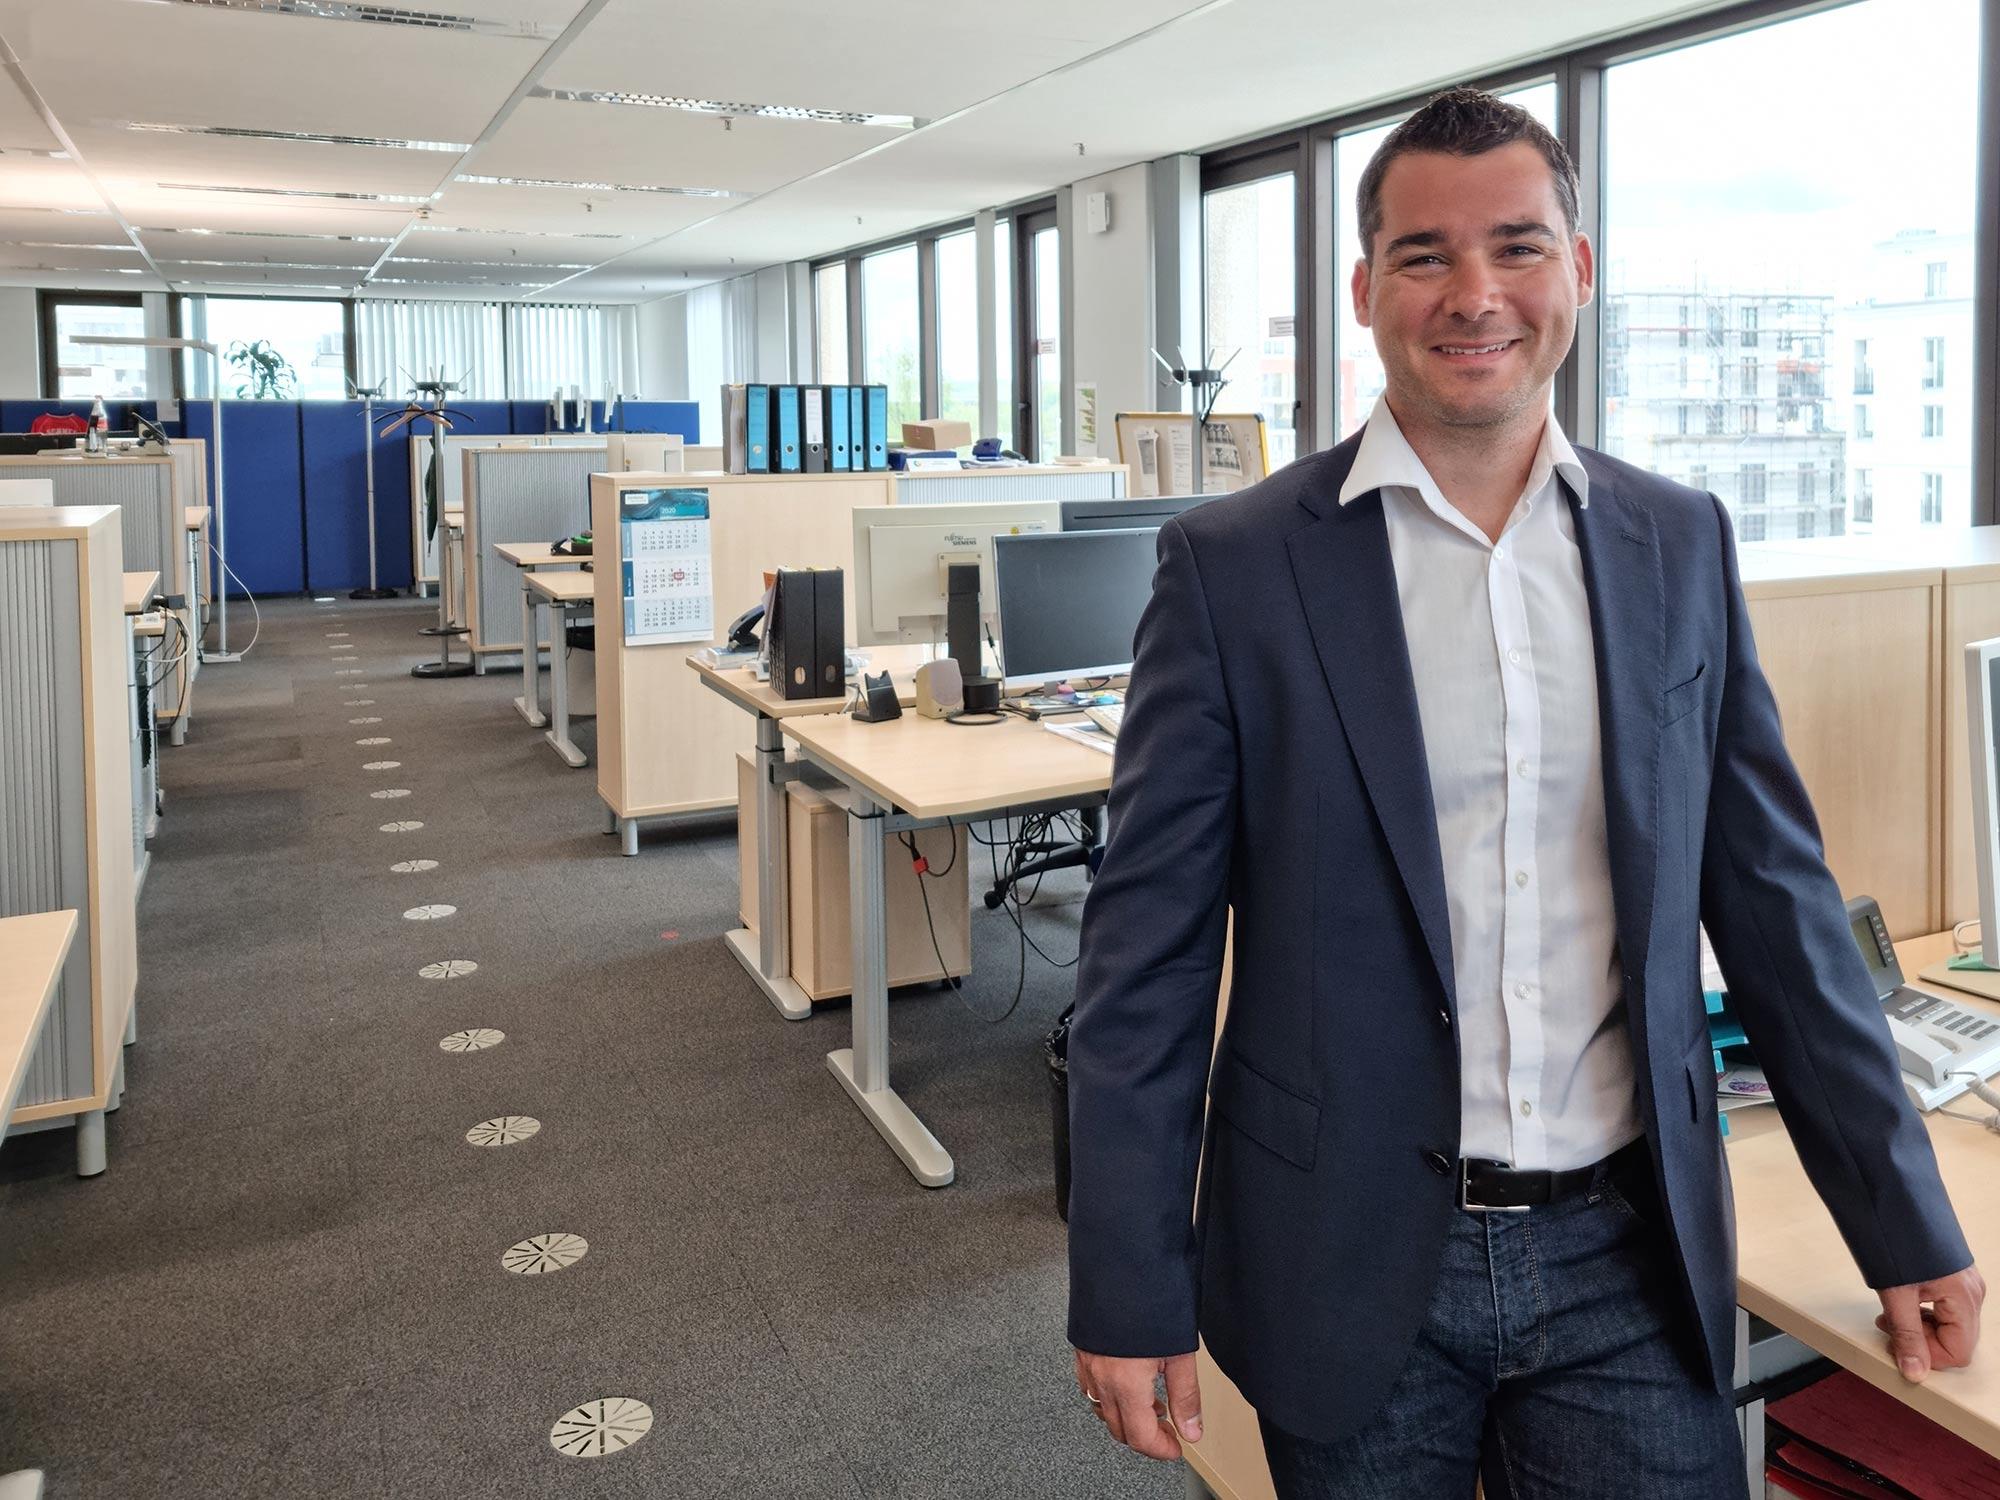 Marco Verardi Frankfurt - Siemens Frankfurt - Siemens Infrastructure - Siemens Smart Infrastructure - Vertriebsleiter Gebäudeautomation Frankfurt am Main